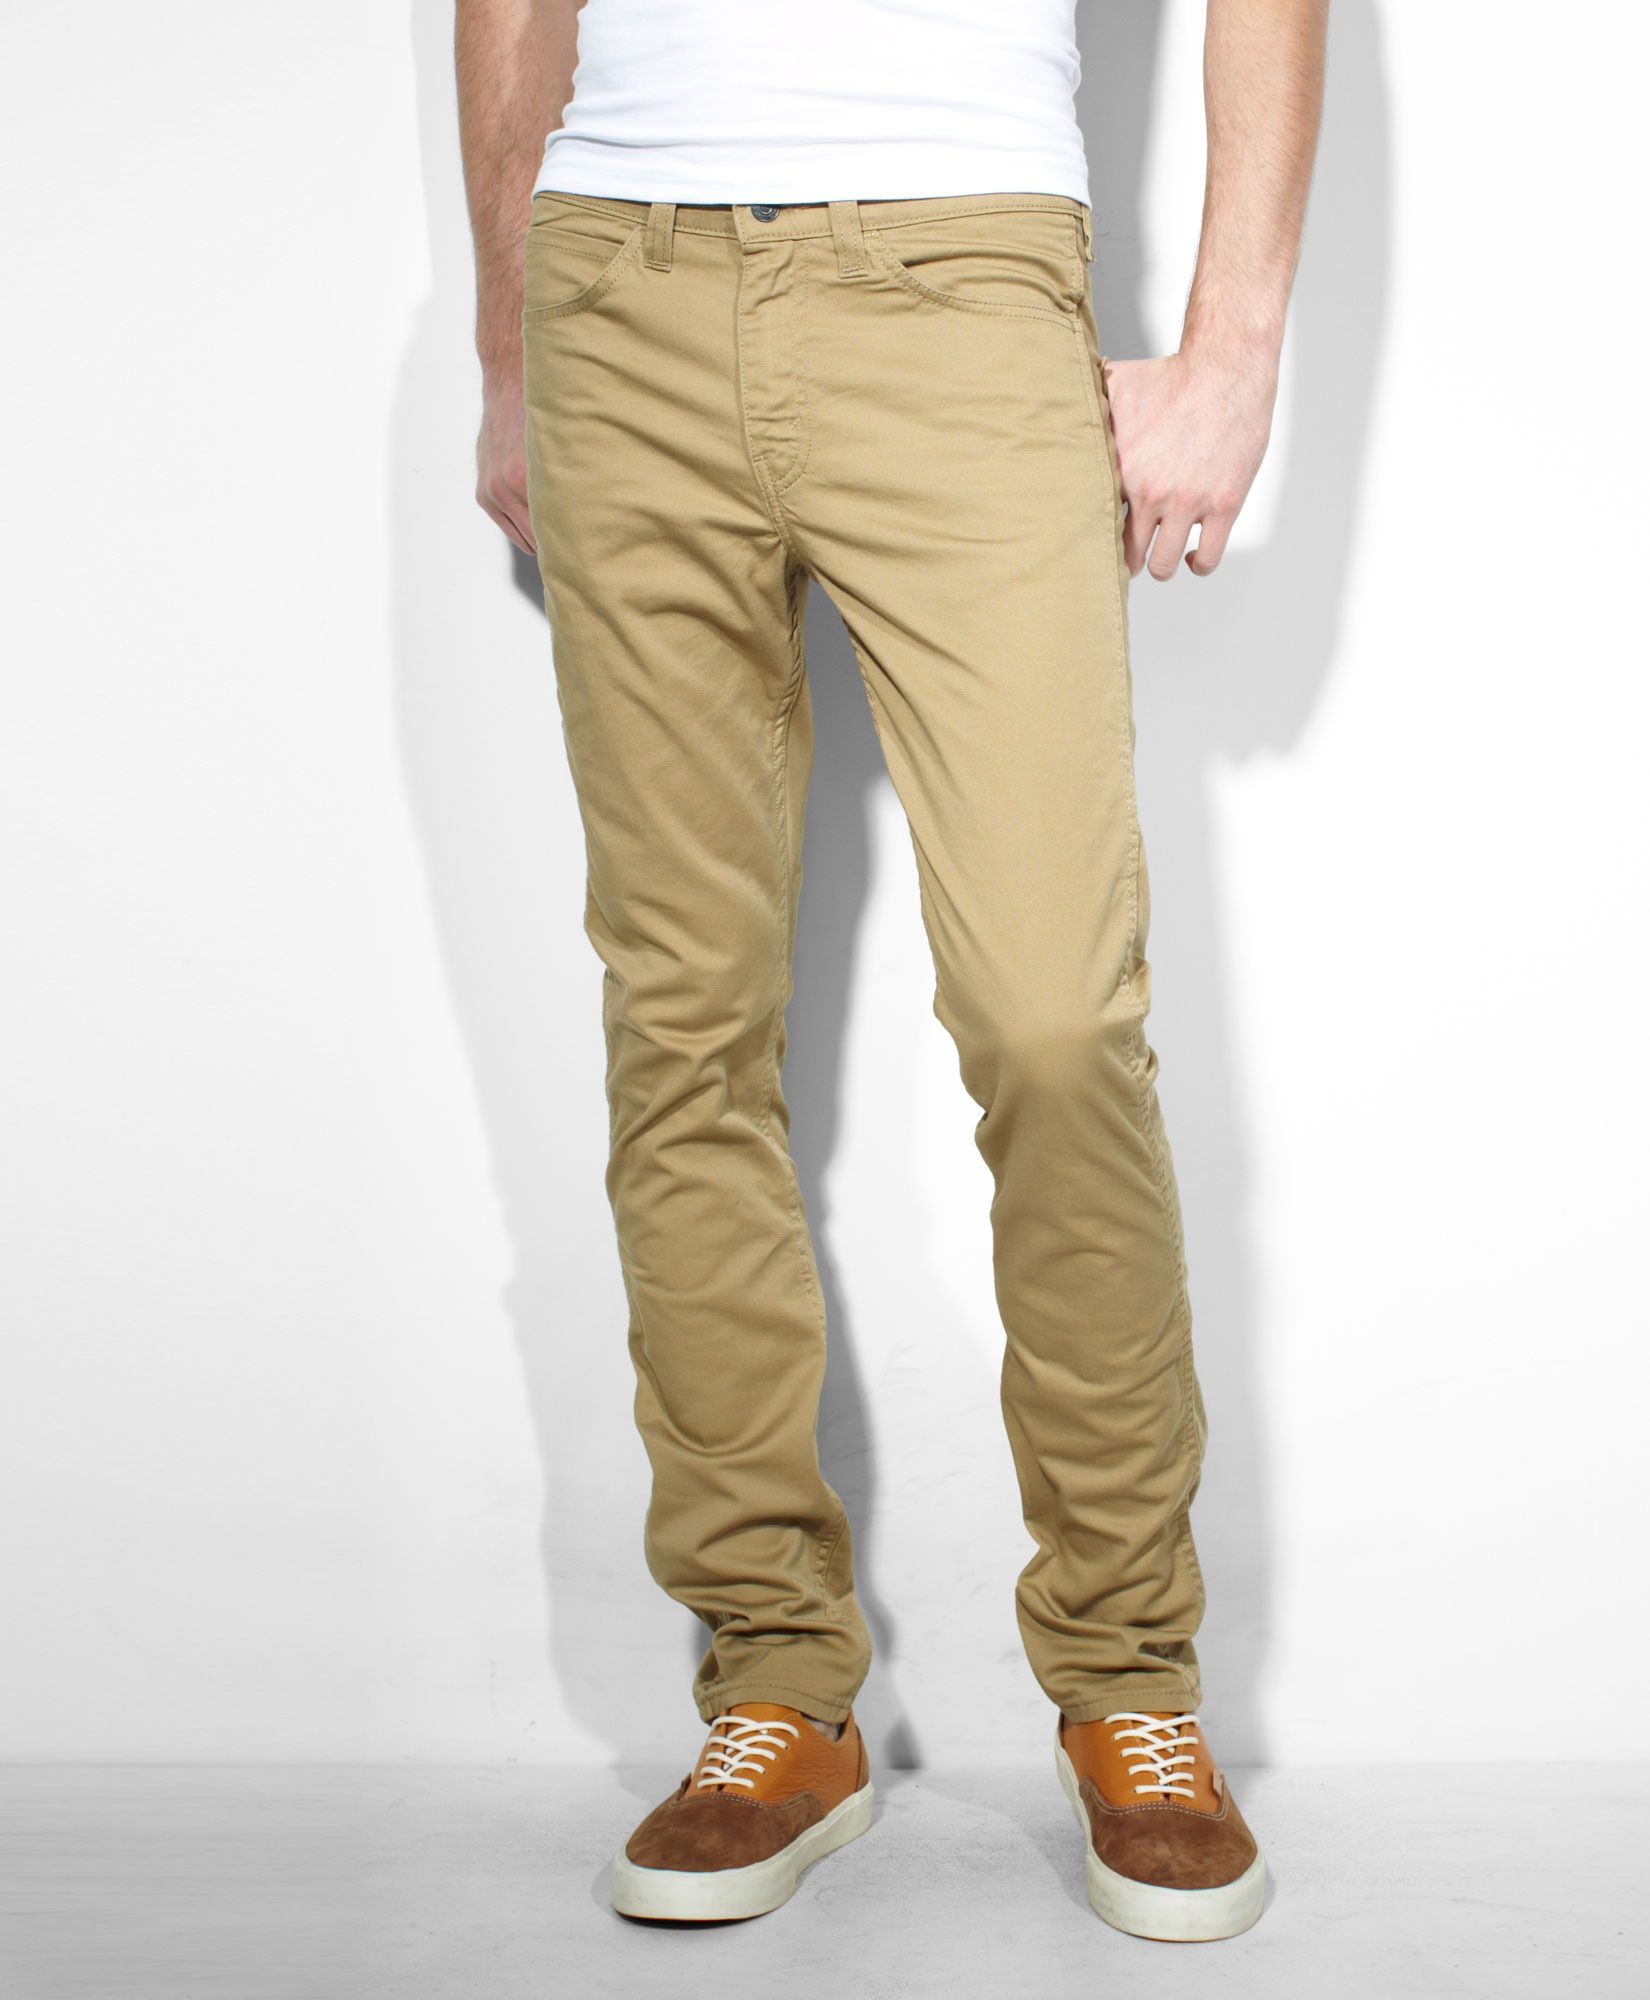 e640287bcb Levis 510™ Skinny Fit Line 8 Pants - Harvest Gold - Jeans